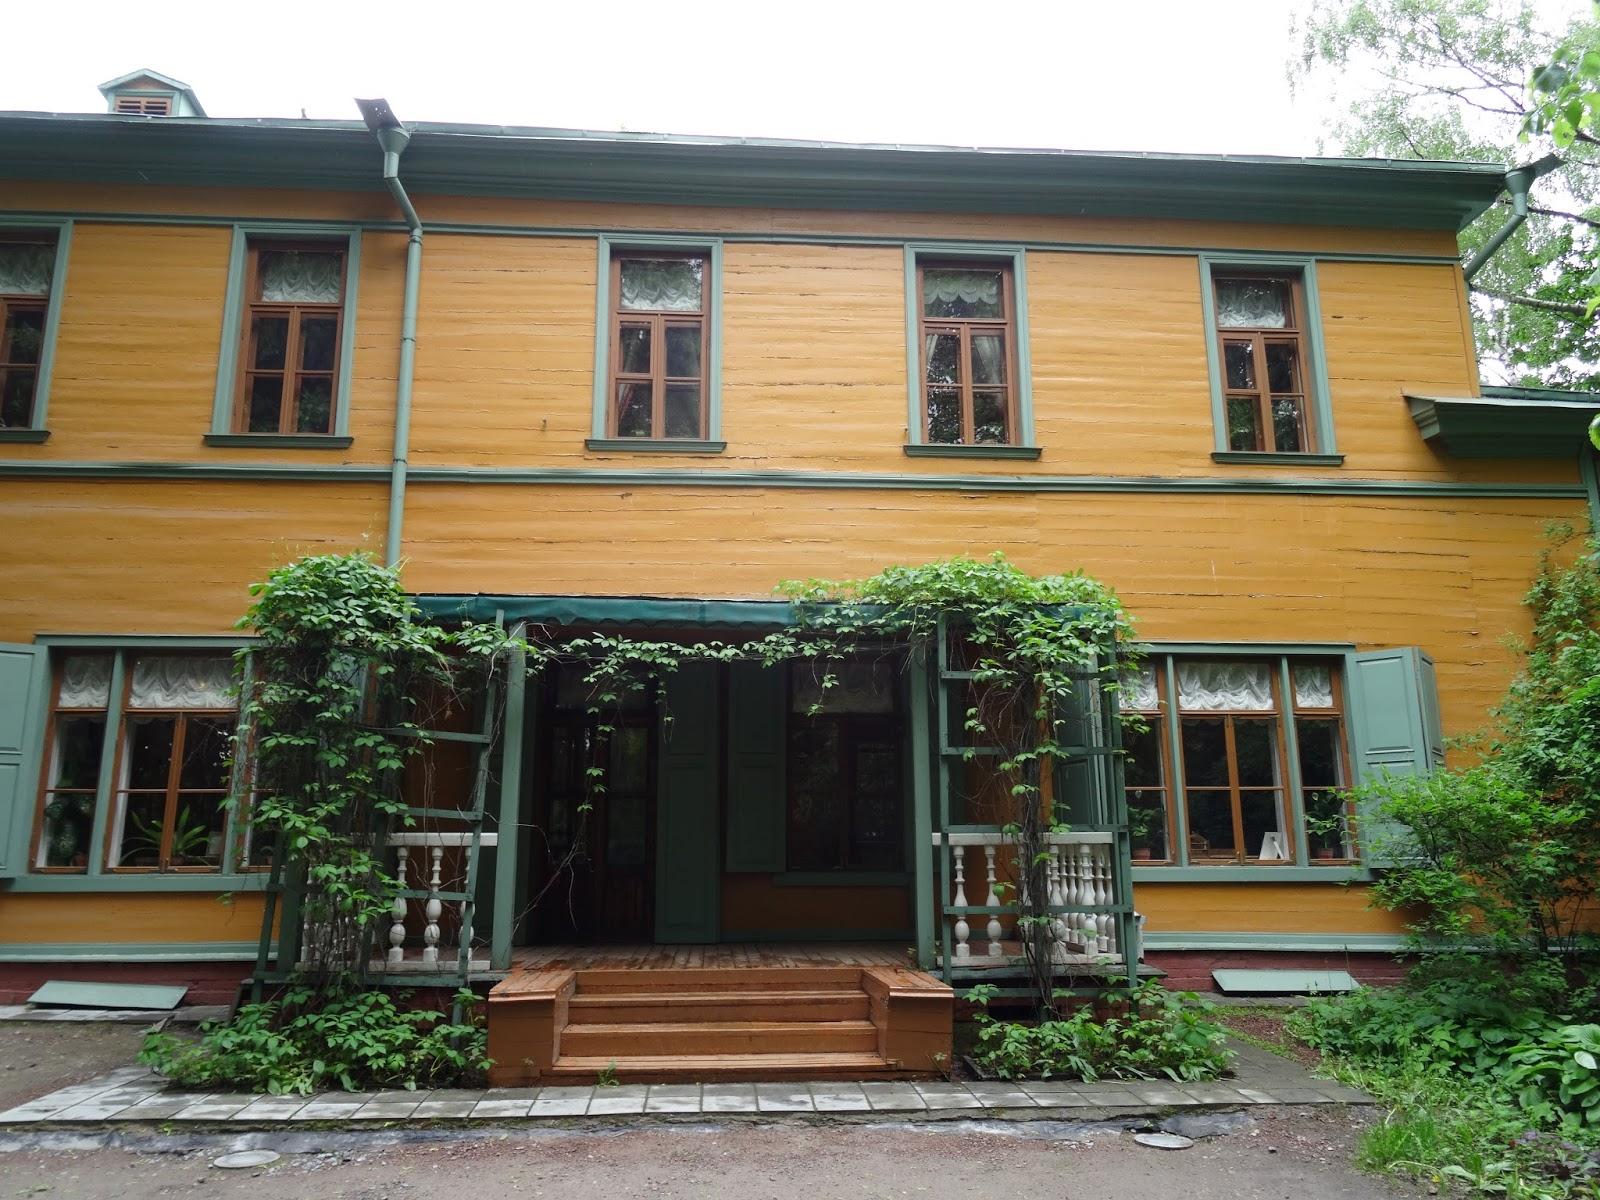 Maison-Musée Tolstoï @ Moscou - Maison-Musée Tolstoï (6)